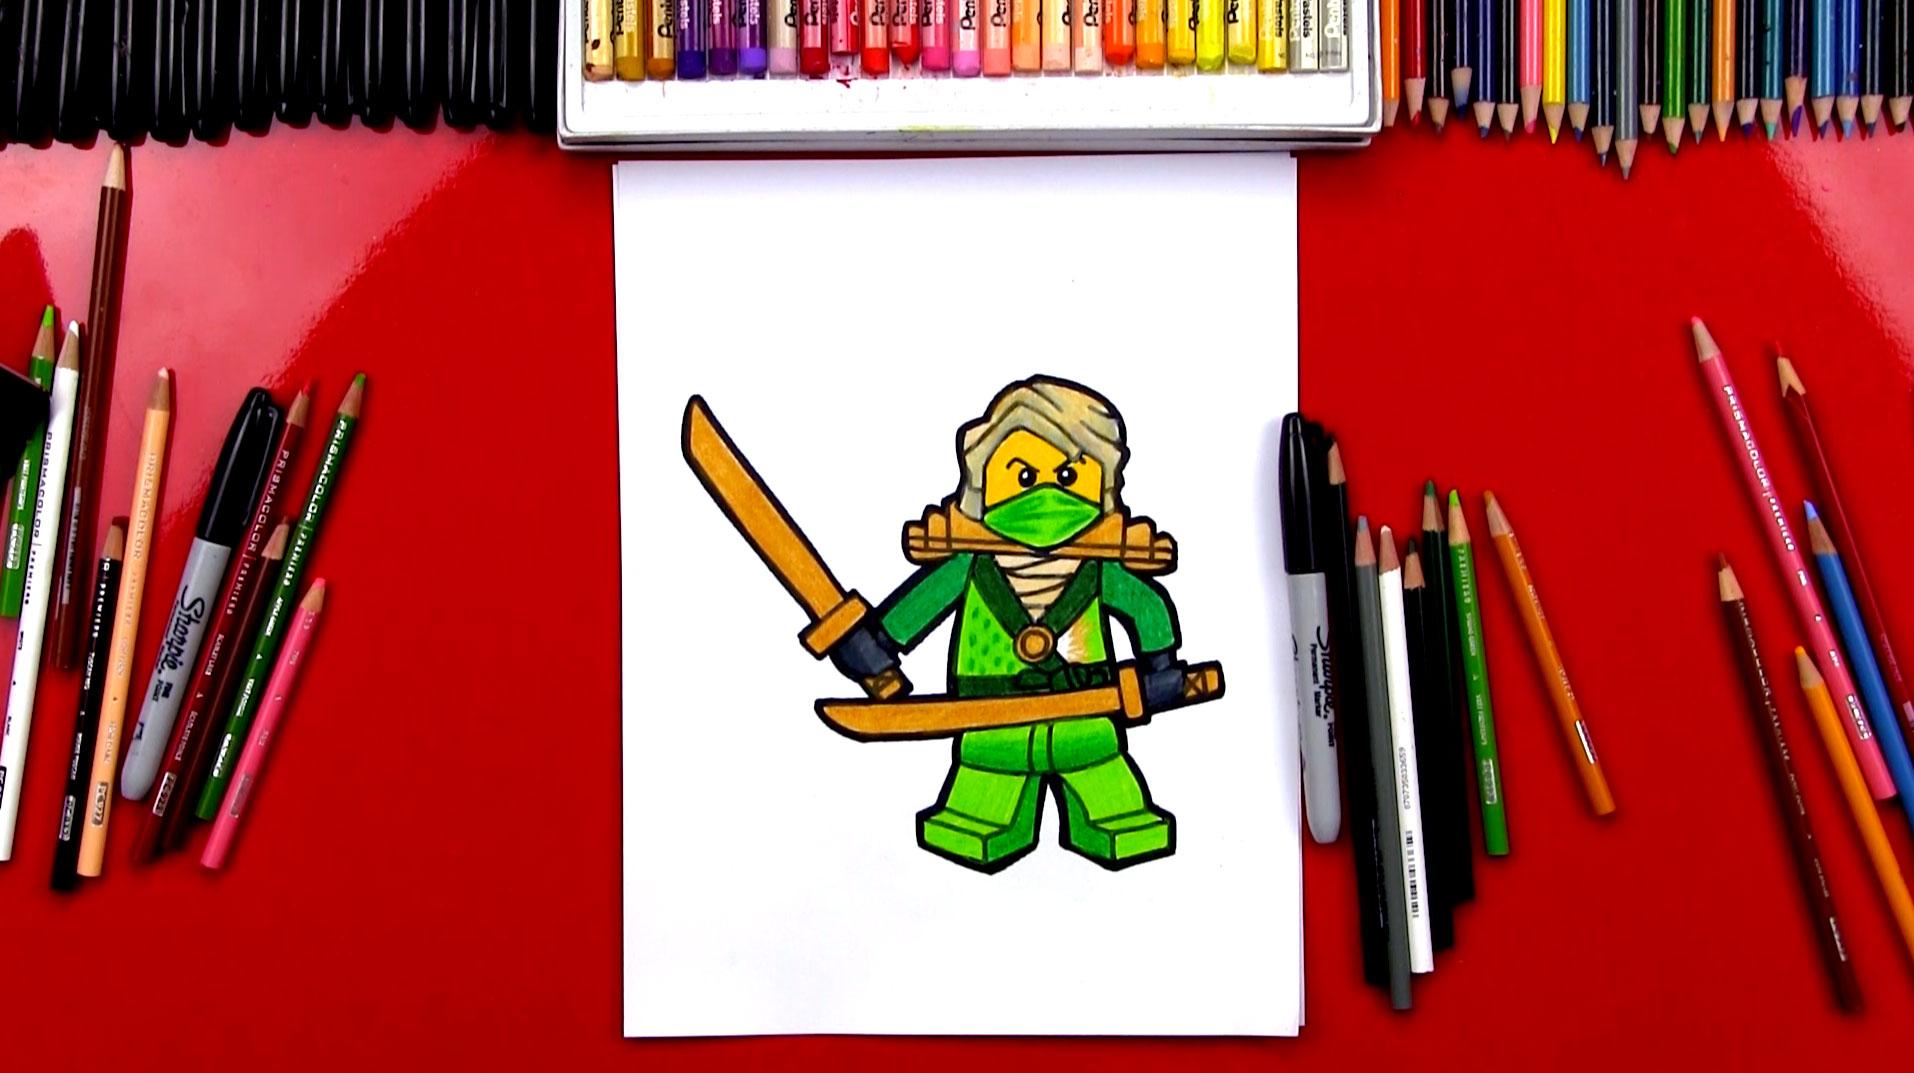 1914x1073 How To Draw Lloyd From Ninjago